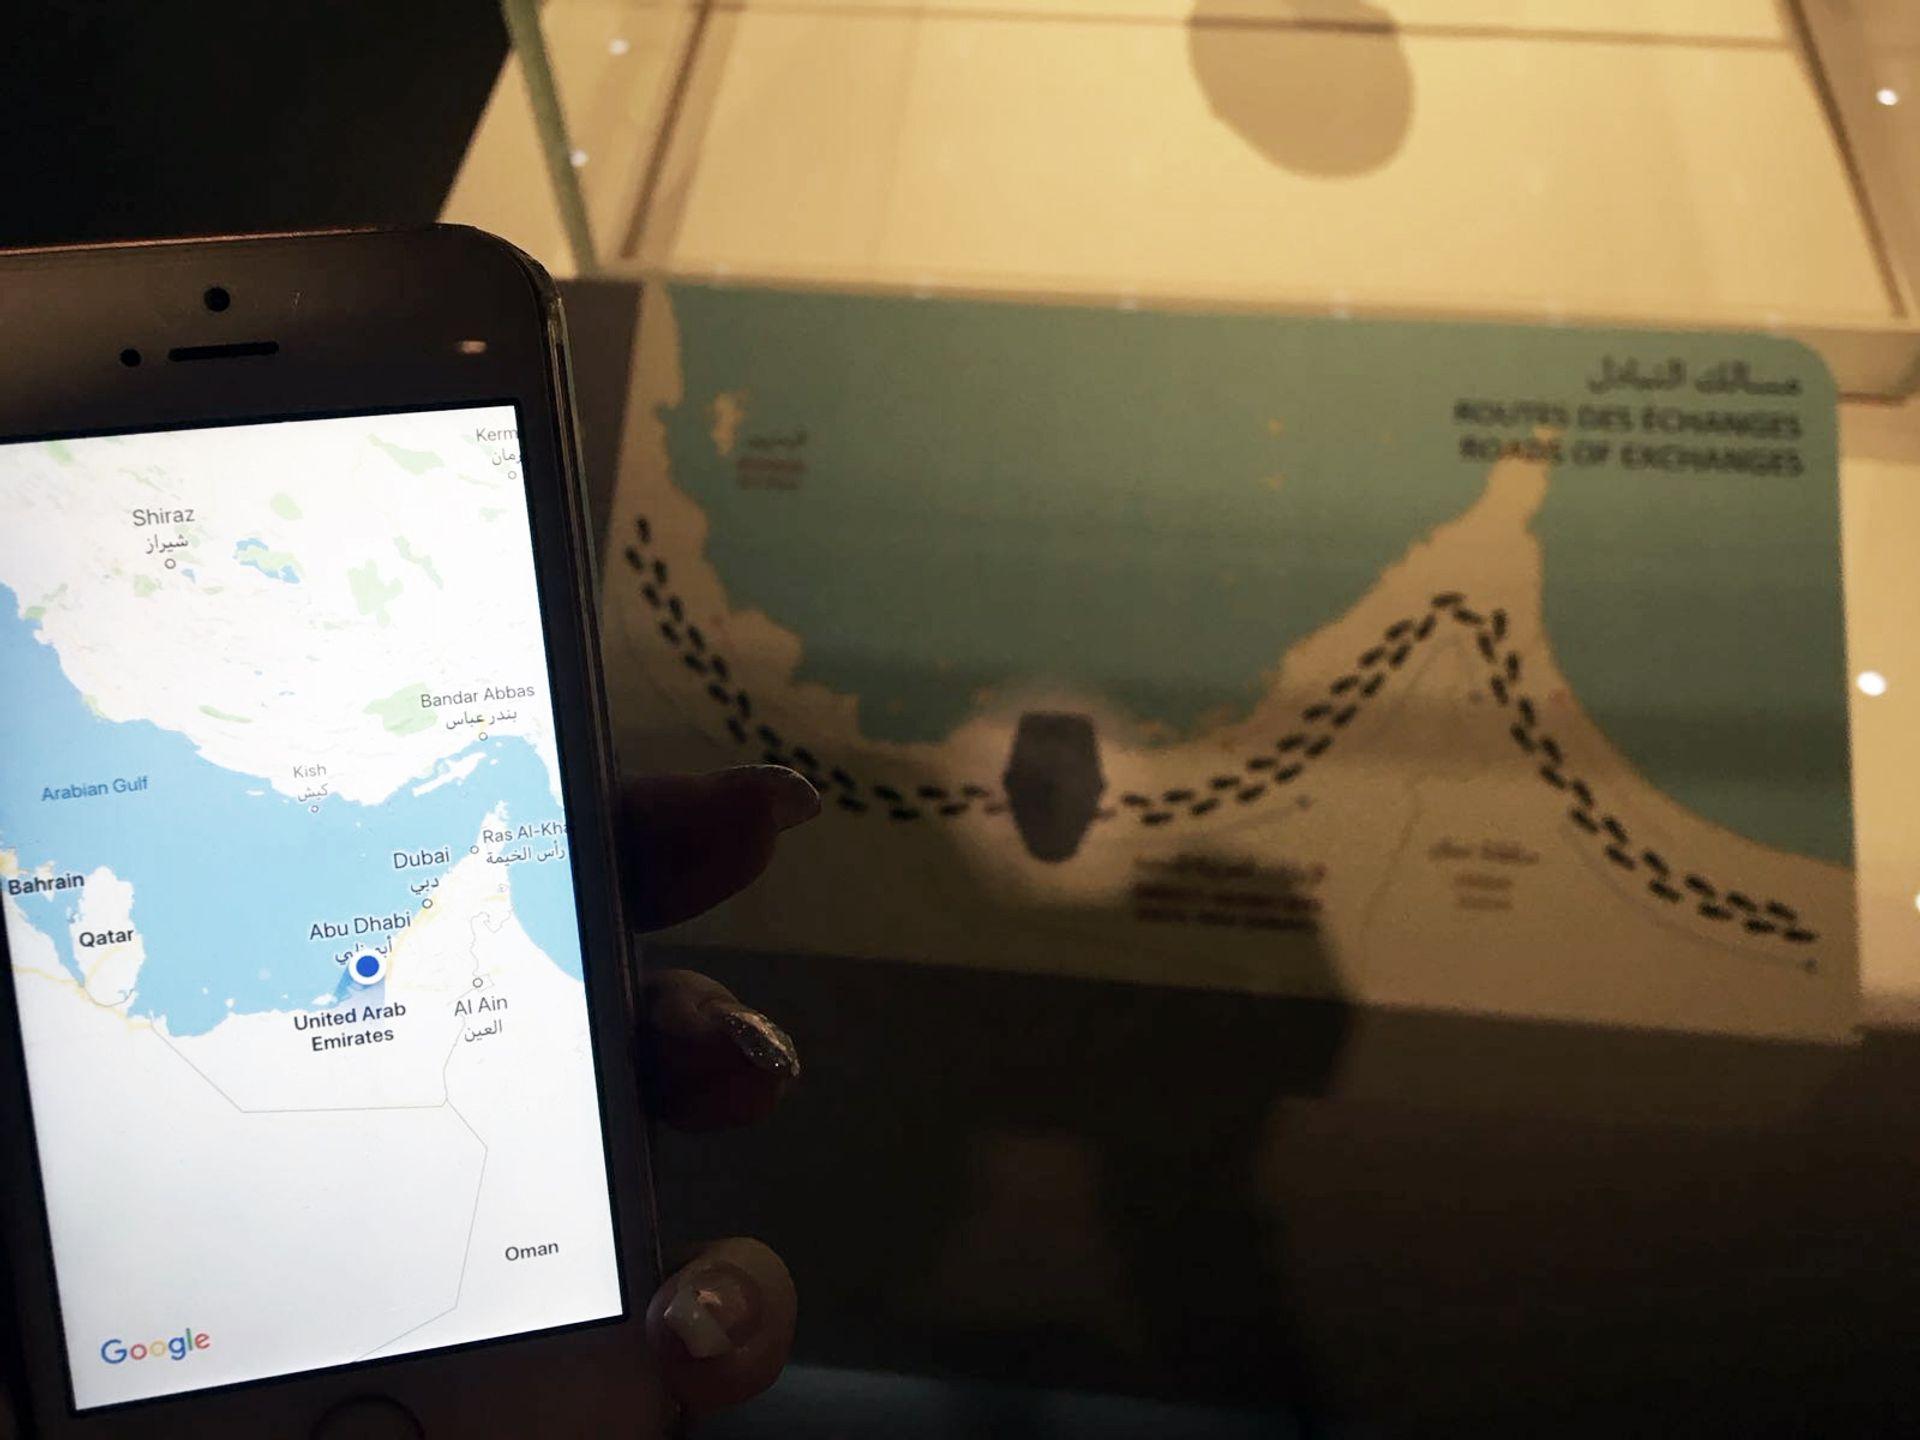 The original map at Louvre Abu Dhabi alongside a Google map of the Gulf Yaz